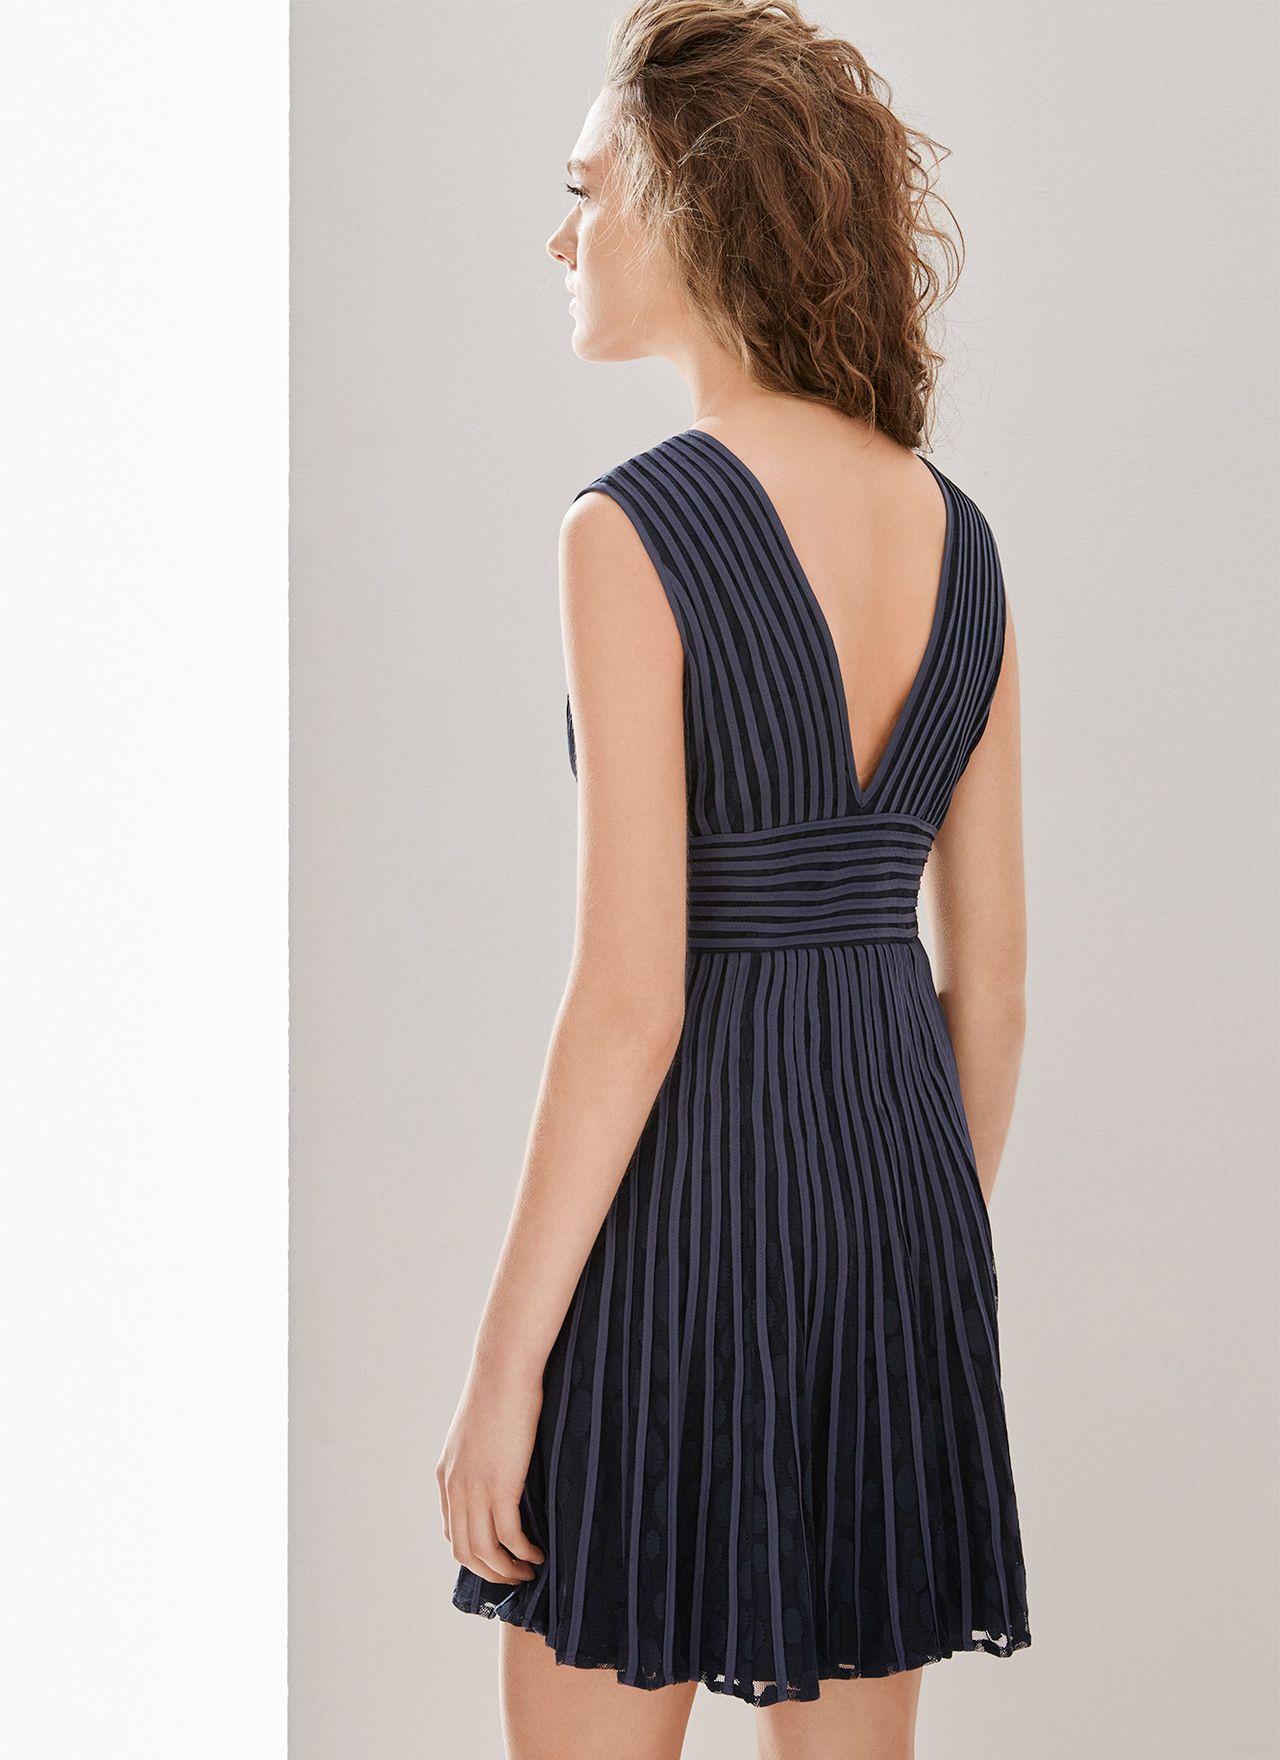 M s de 25 ideas incre bles sobre vestidos adolfo dominguez for Adolfo dominguez costura